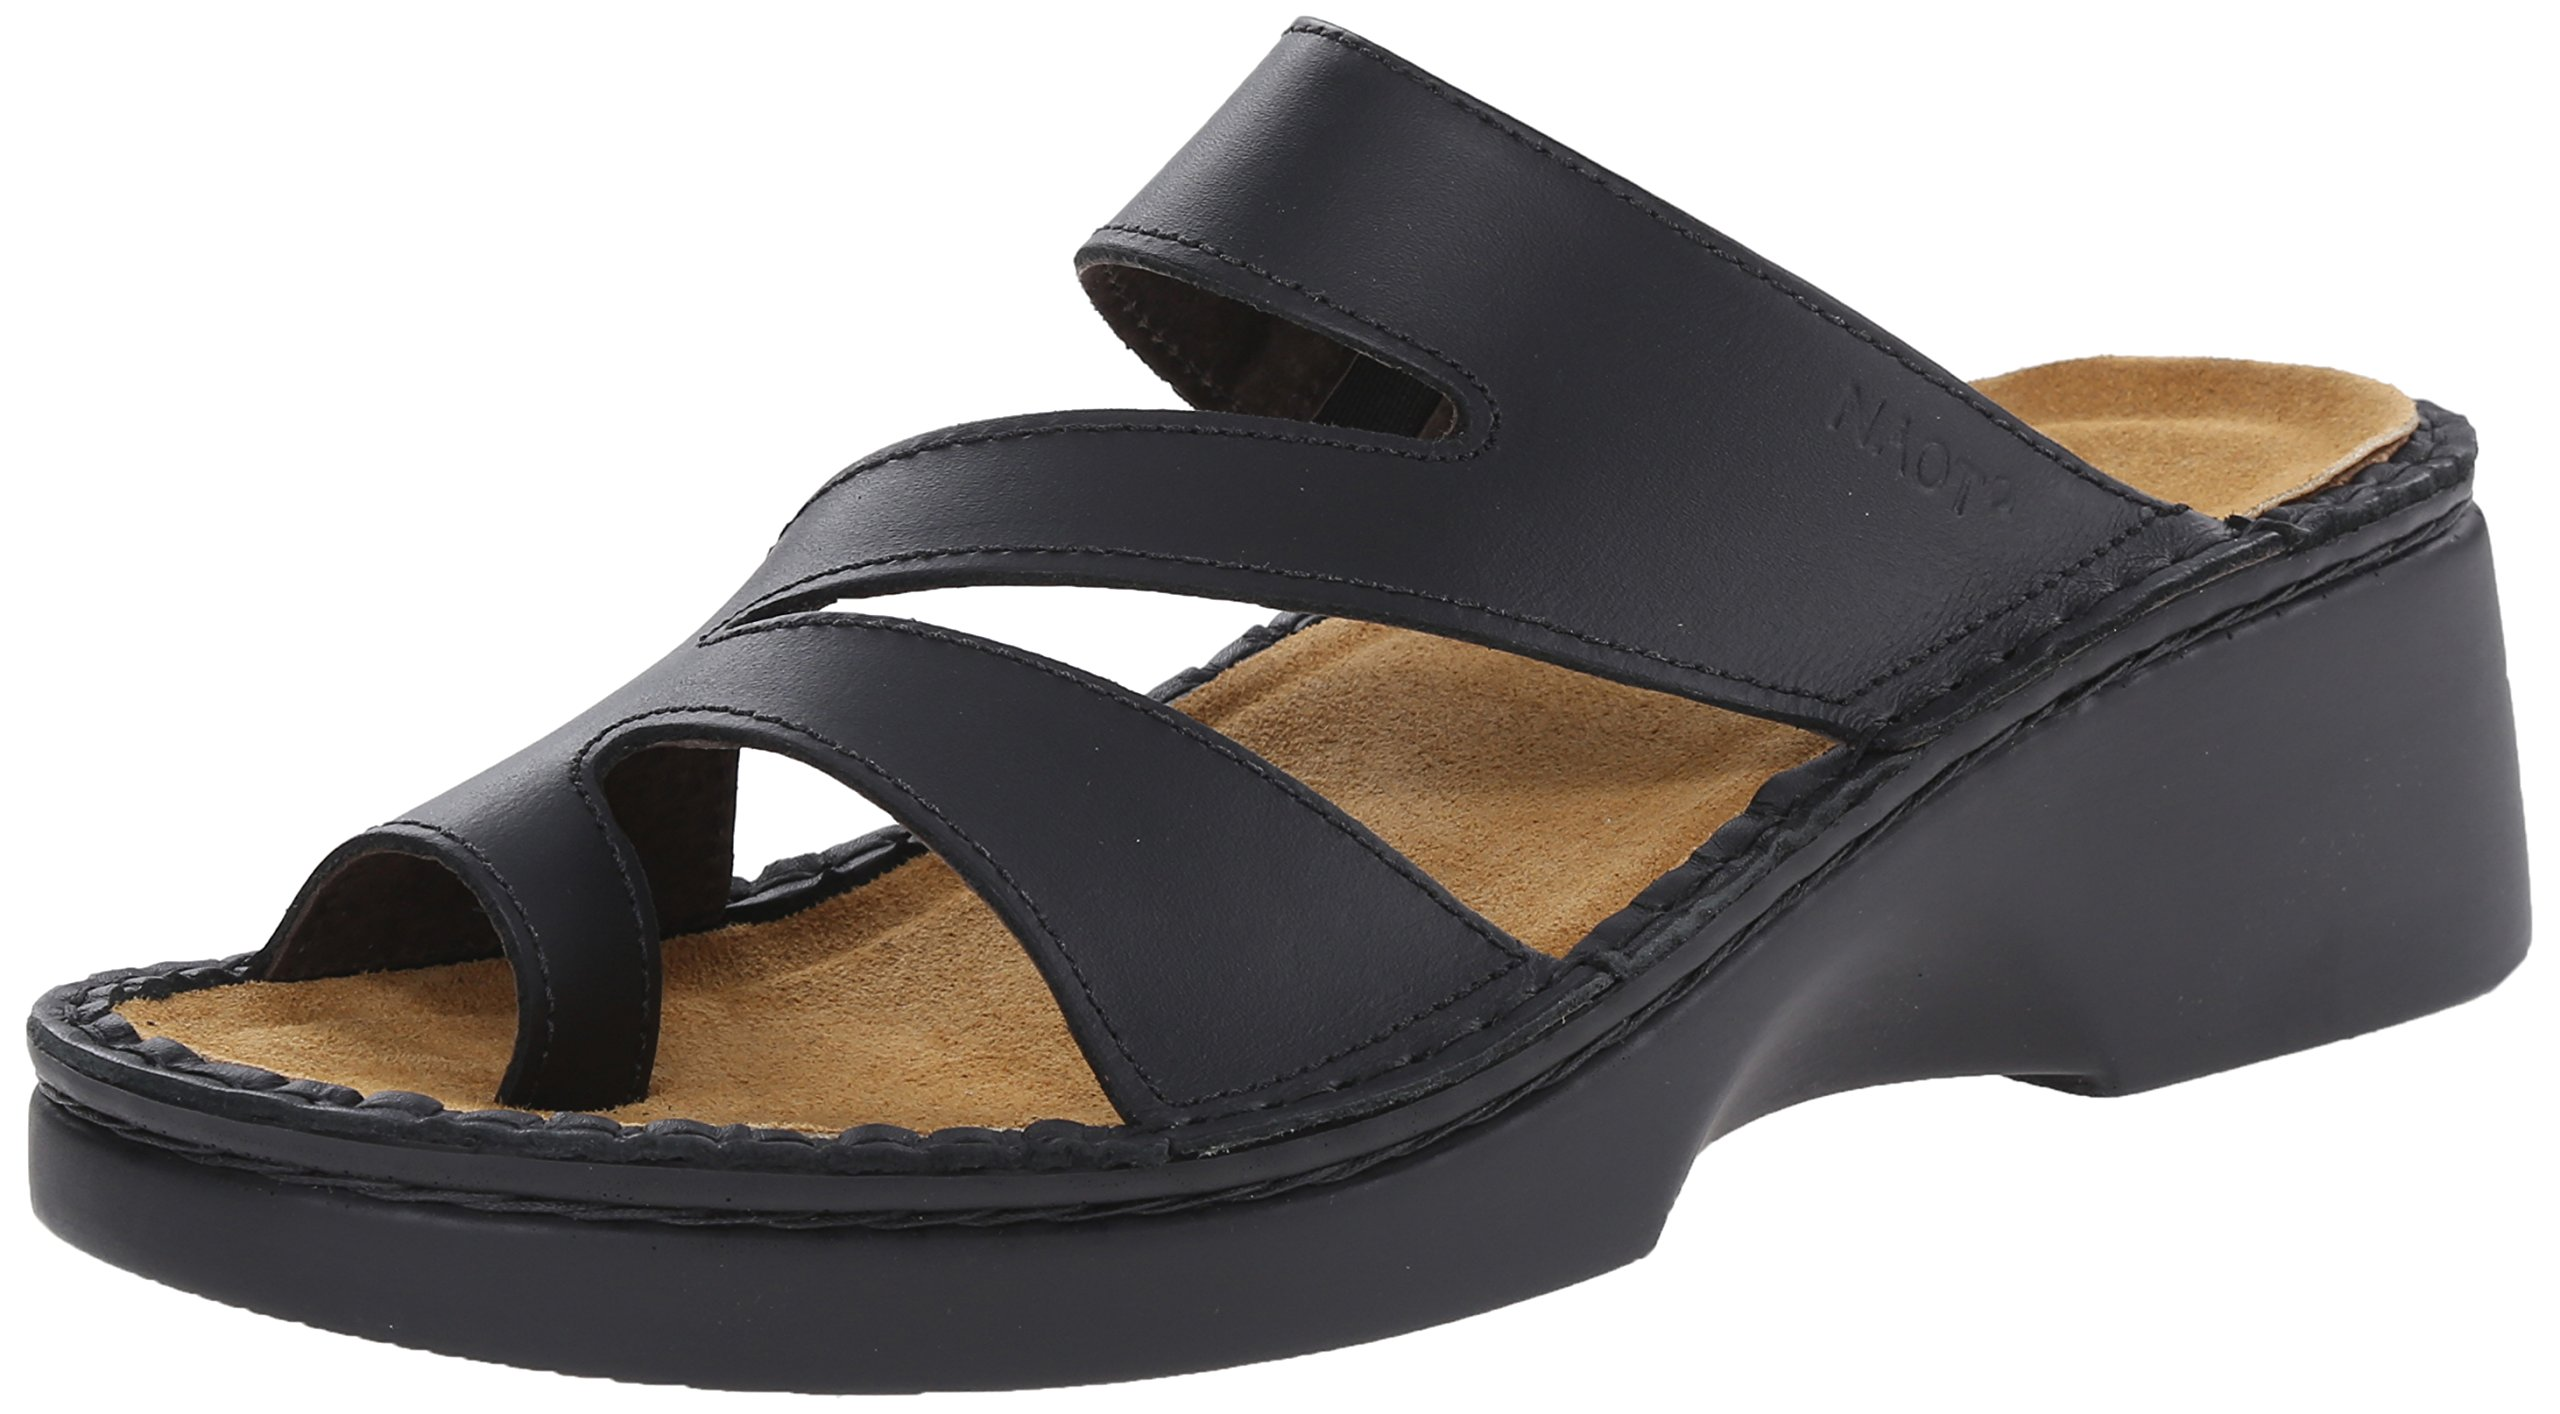 Naot Women's Monterey Wedge Sandal, Black Matte Leather, 39 EU/7.5-8 M US